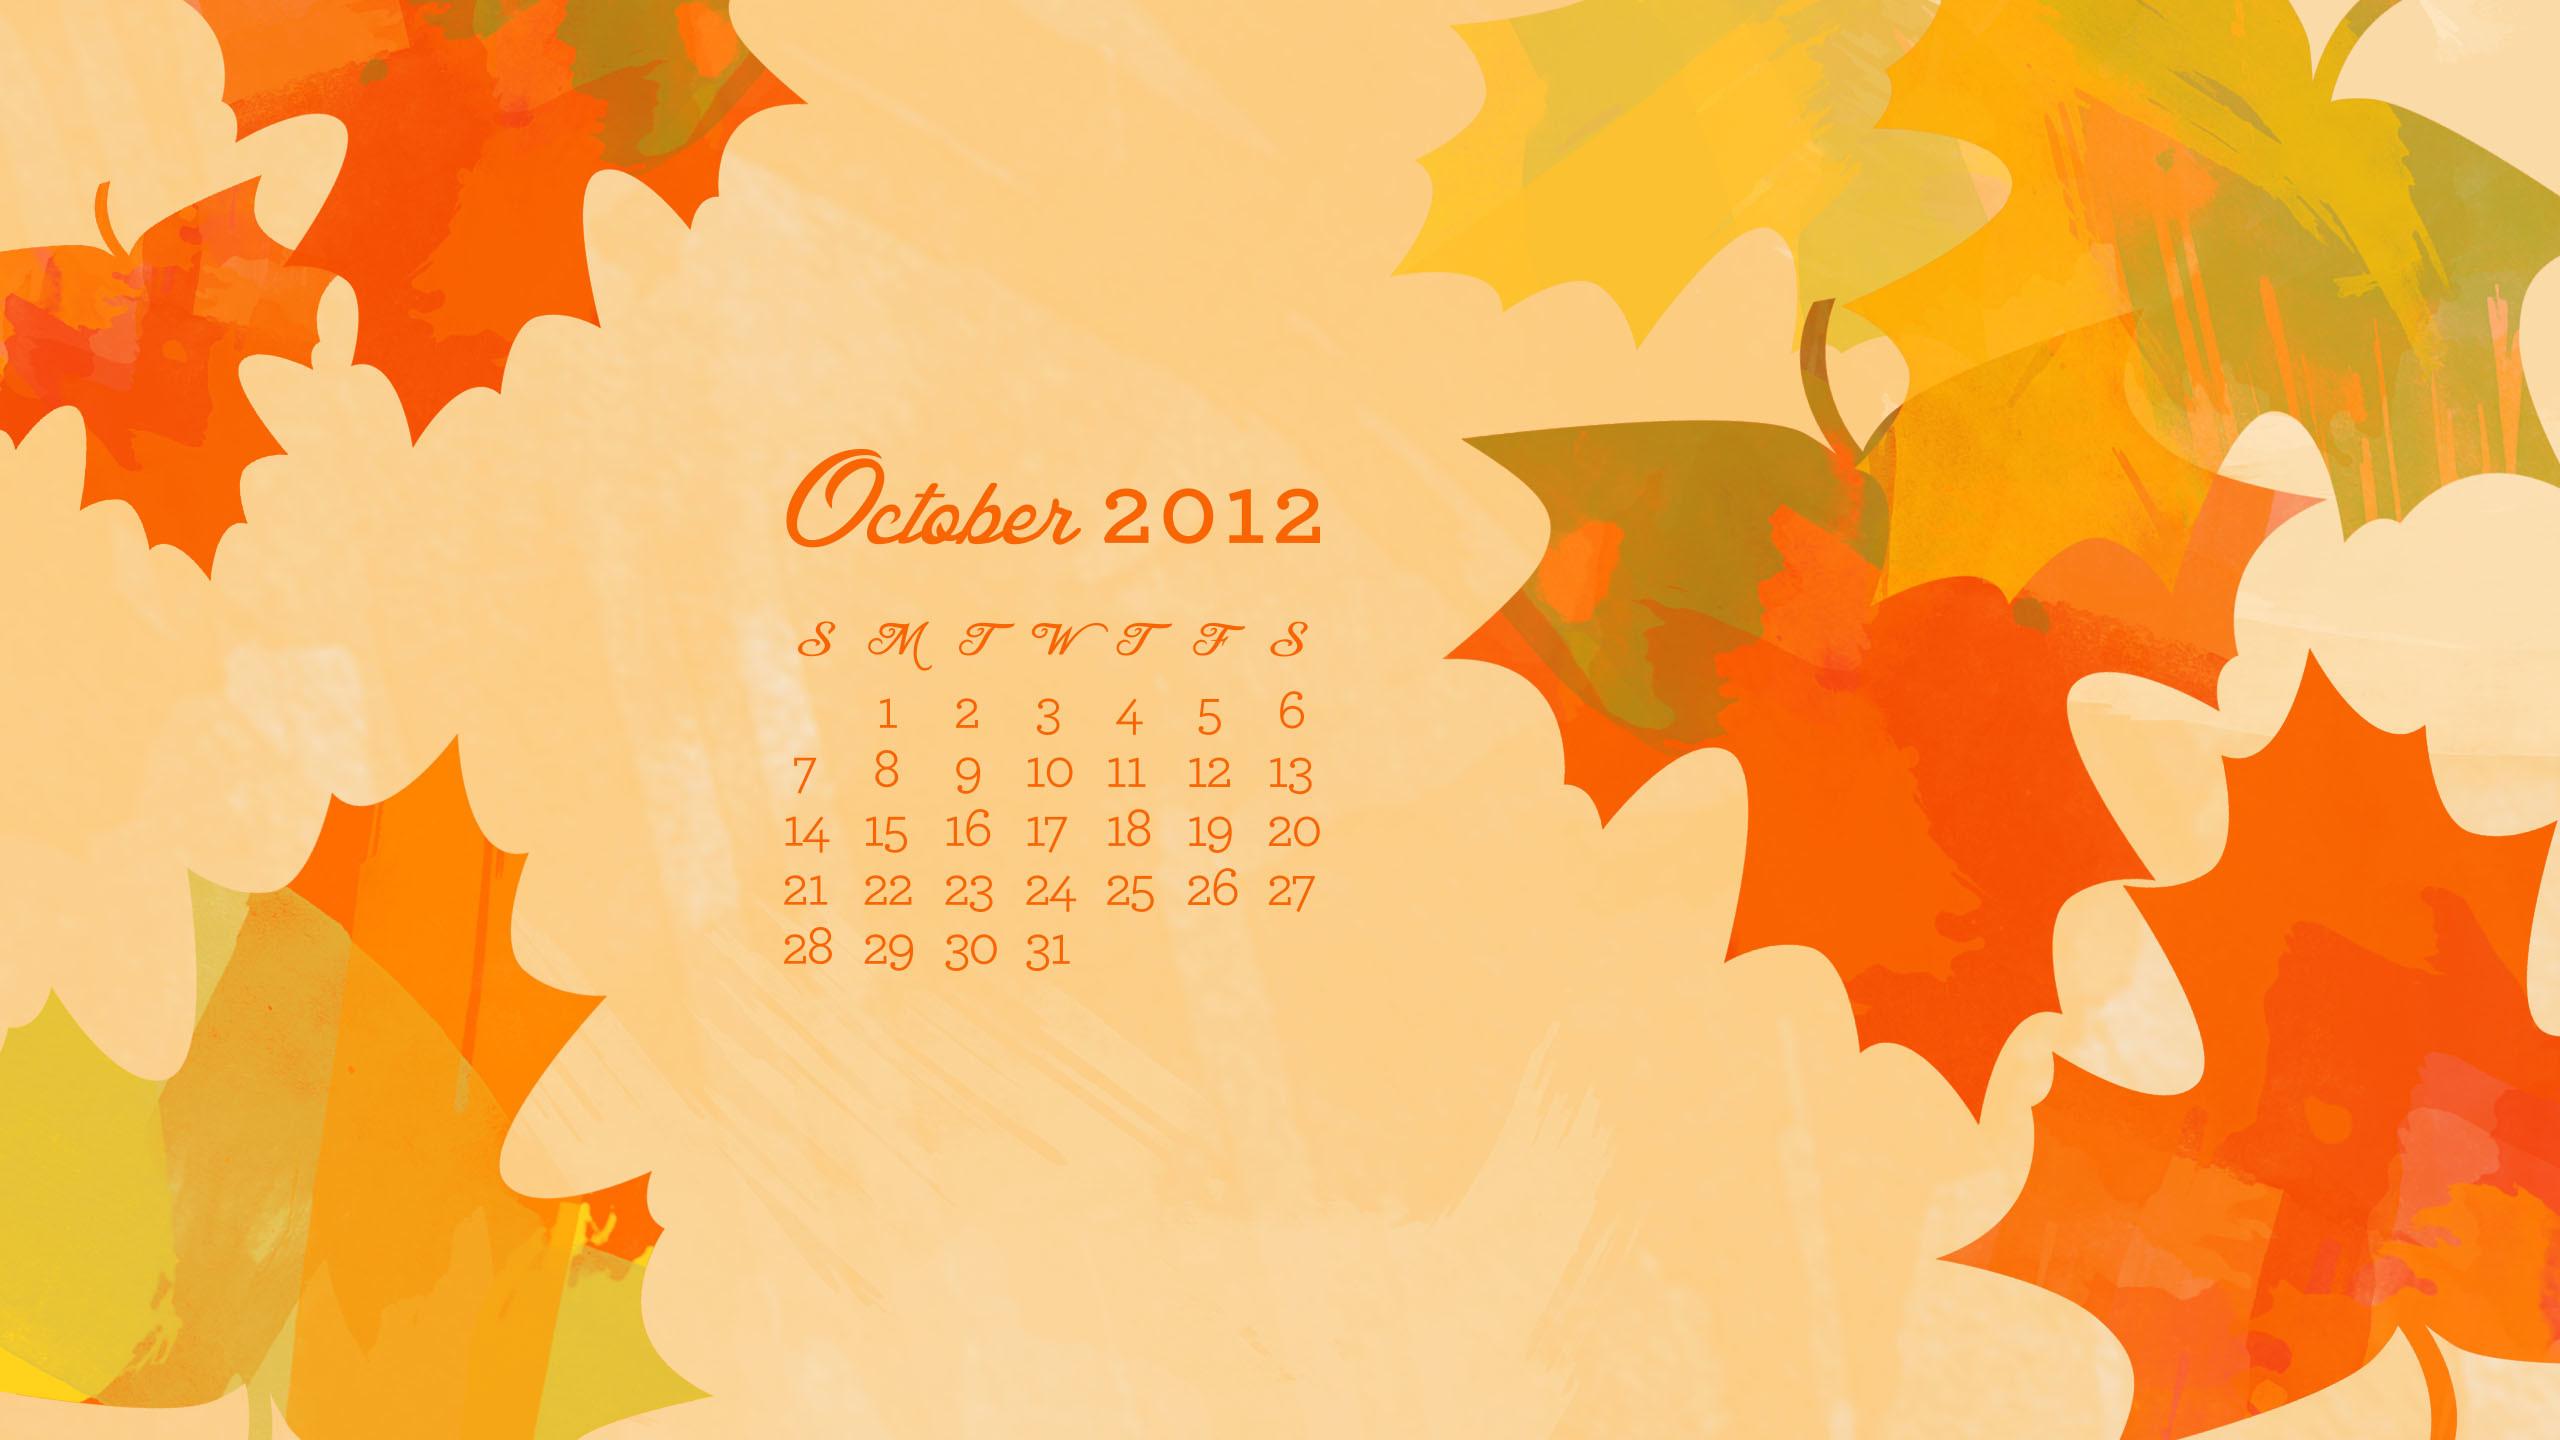 October 2012 Desktop, iPhone & iPad Calendar Wallpaper – Sarah Hearts